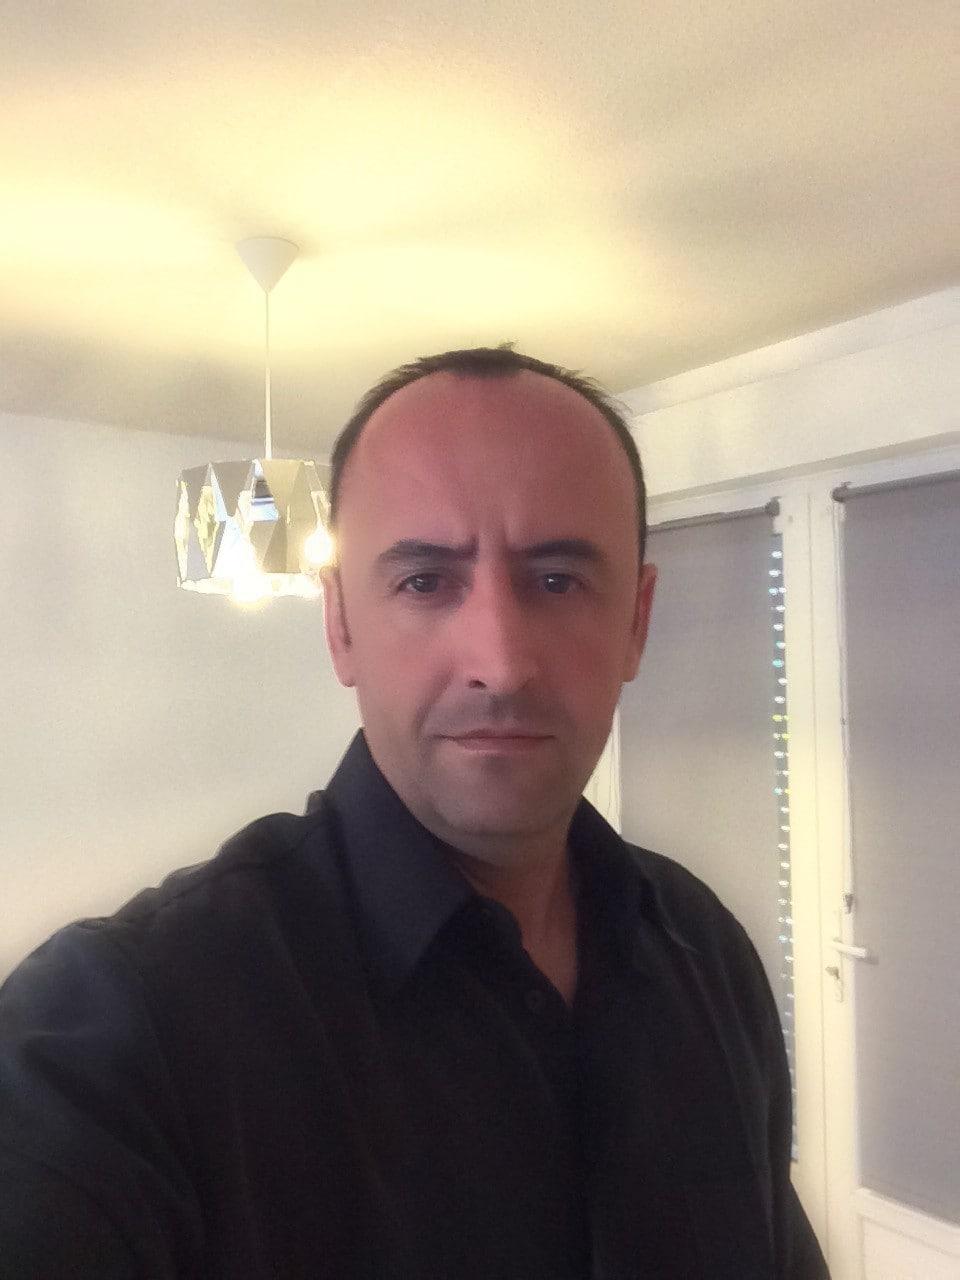 Fabrice from Argelès-sur-Mer